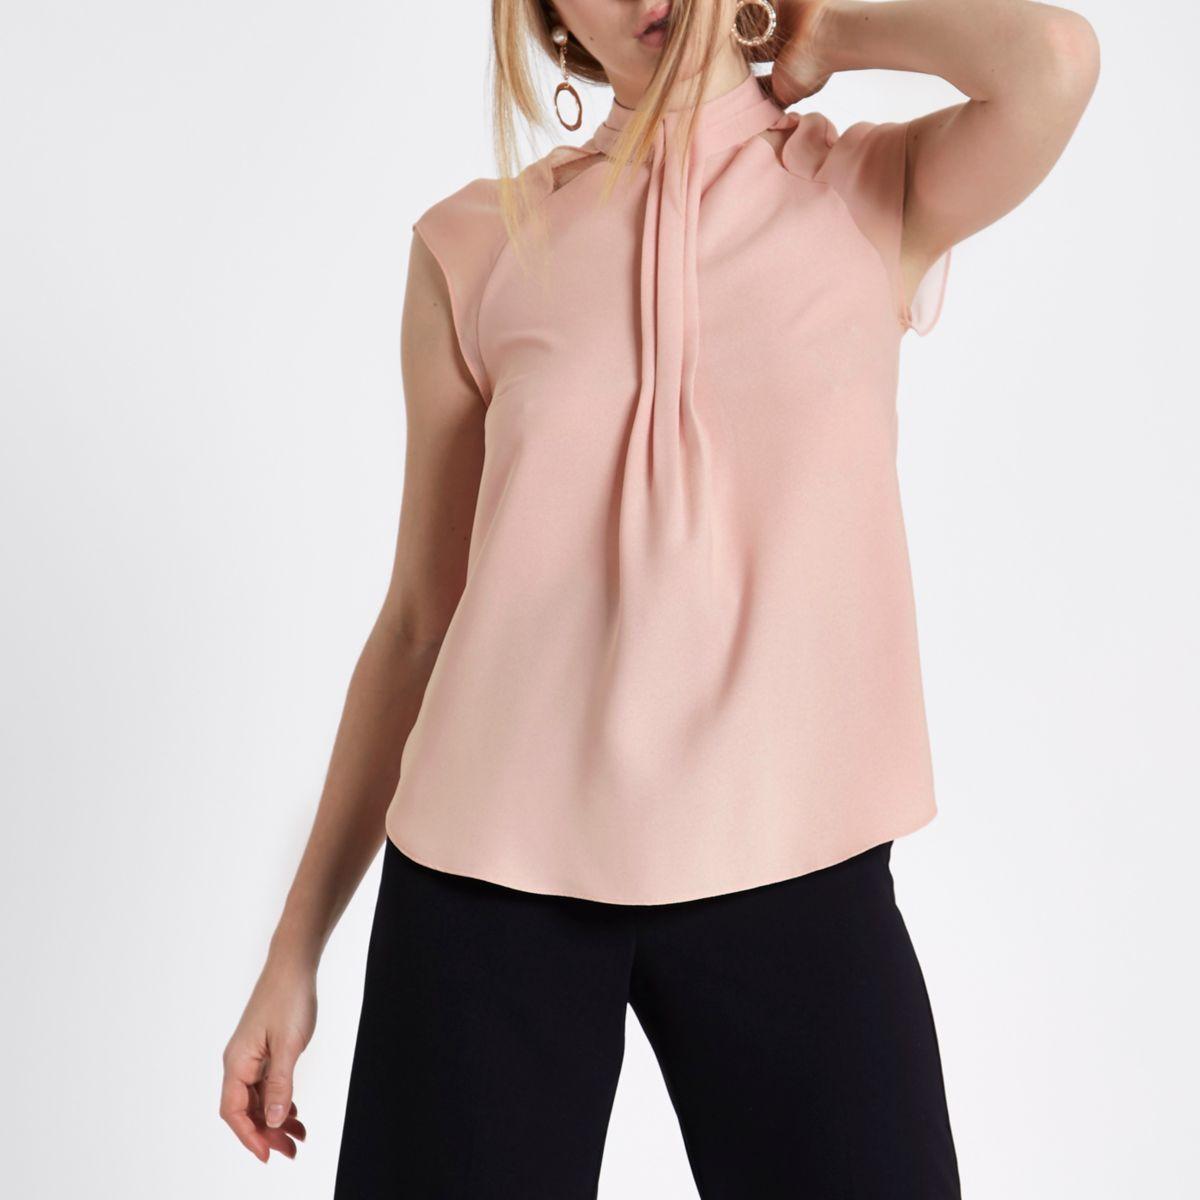 Pink  high neck chiffon top